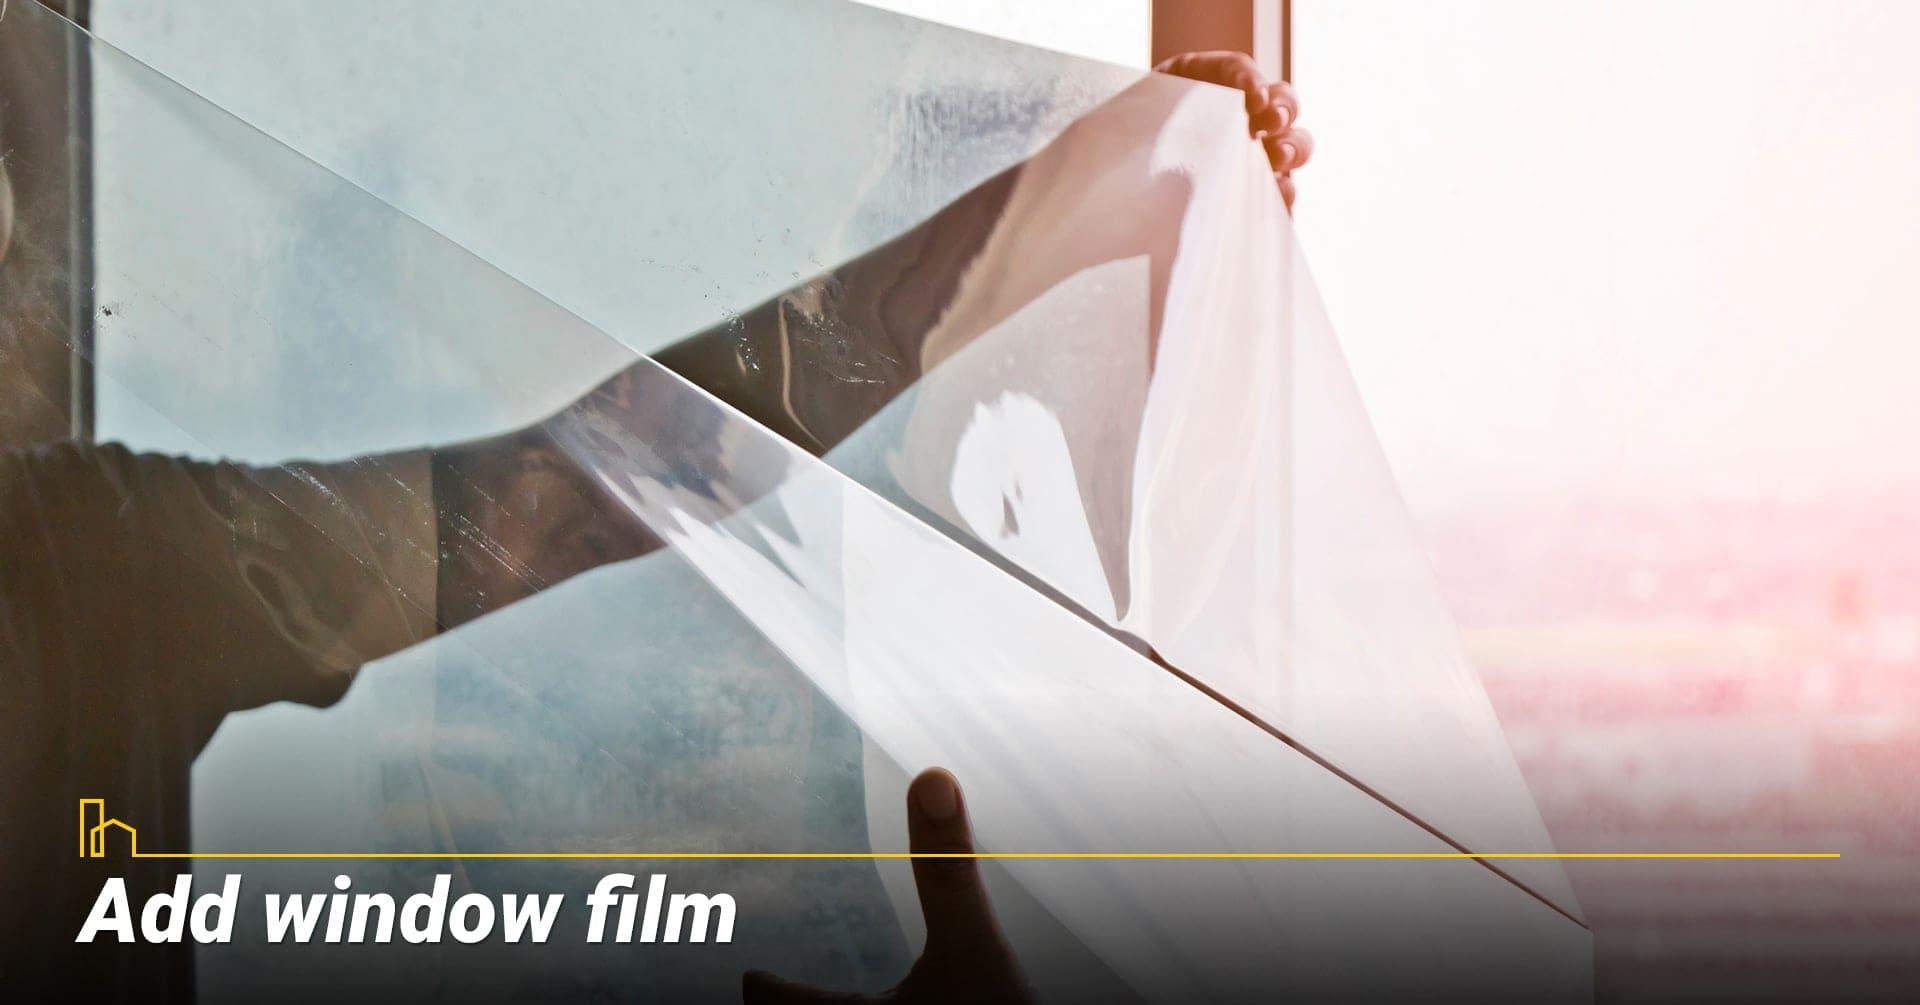 Add window film, use reflective window film